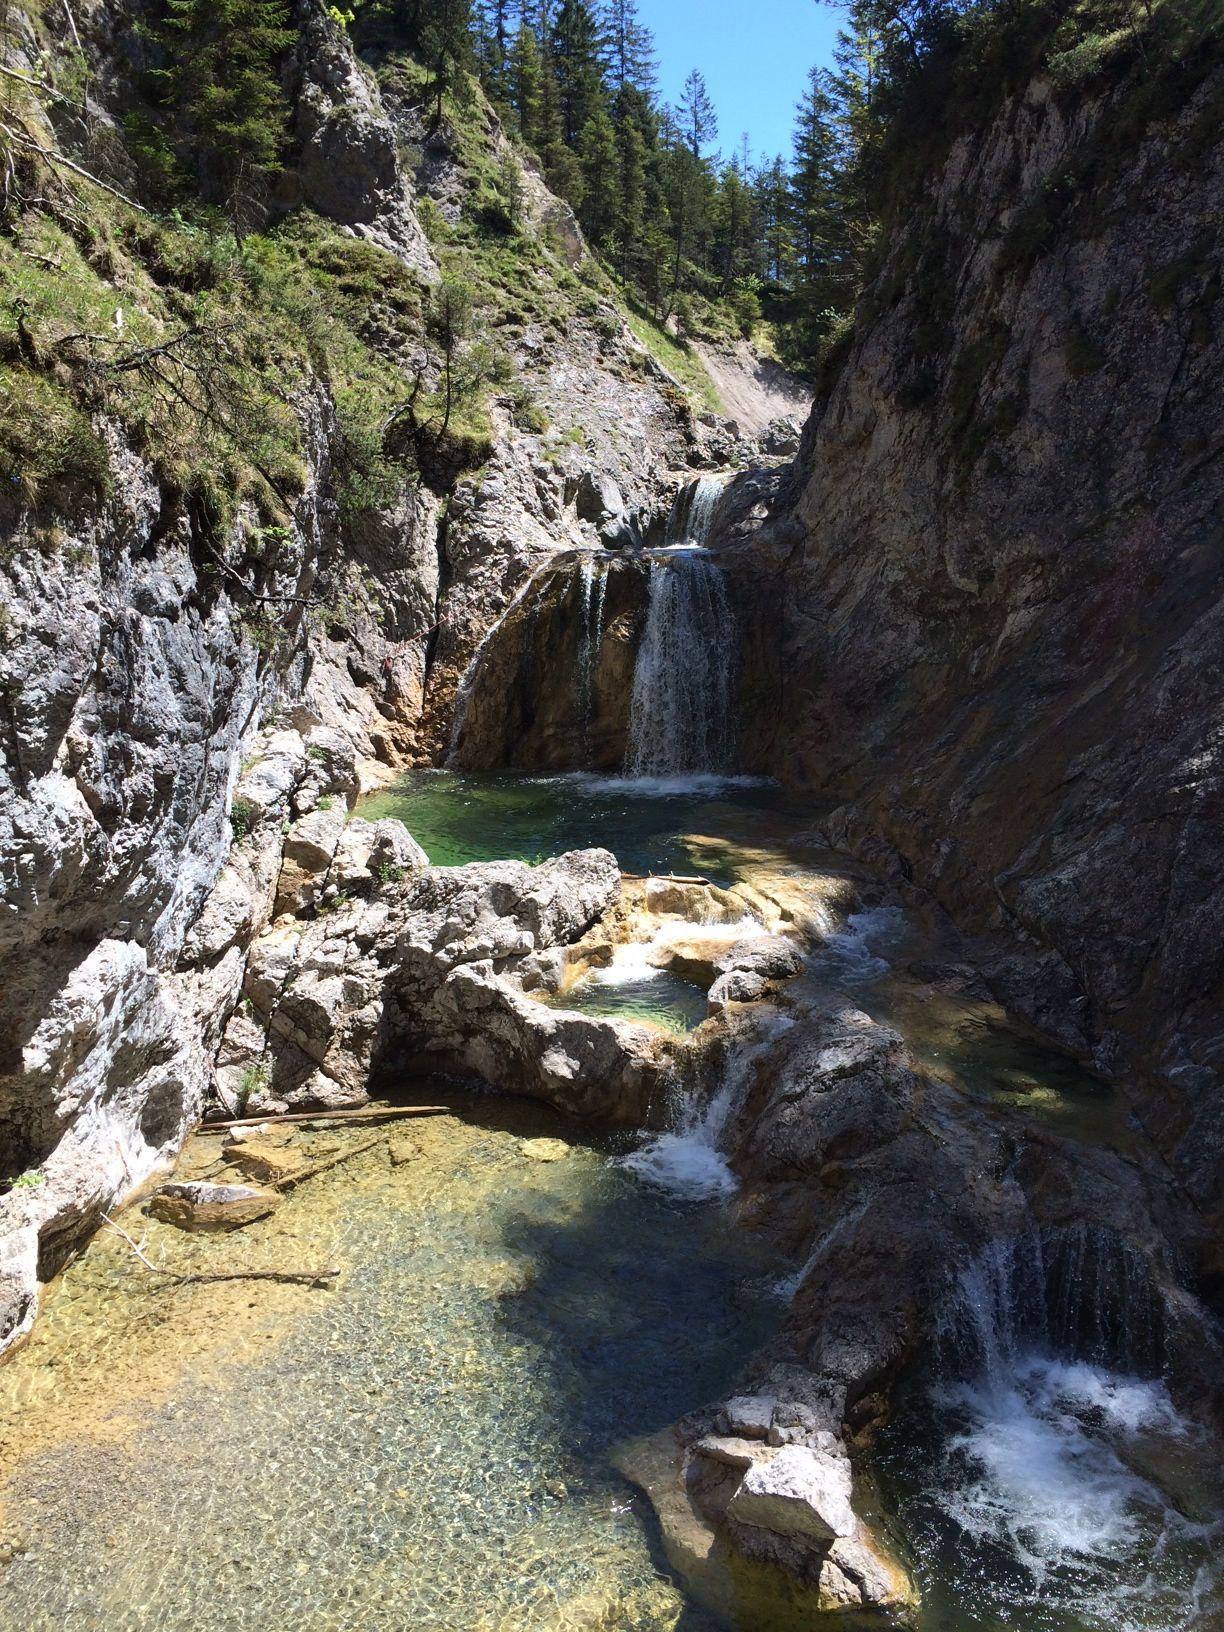 Stuibenfalle Reutte Austria Tirol Wanderweg Reiseziele Ausflug Tirol